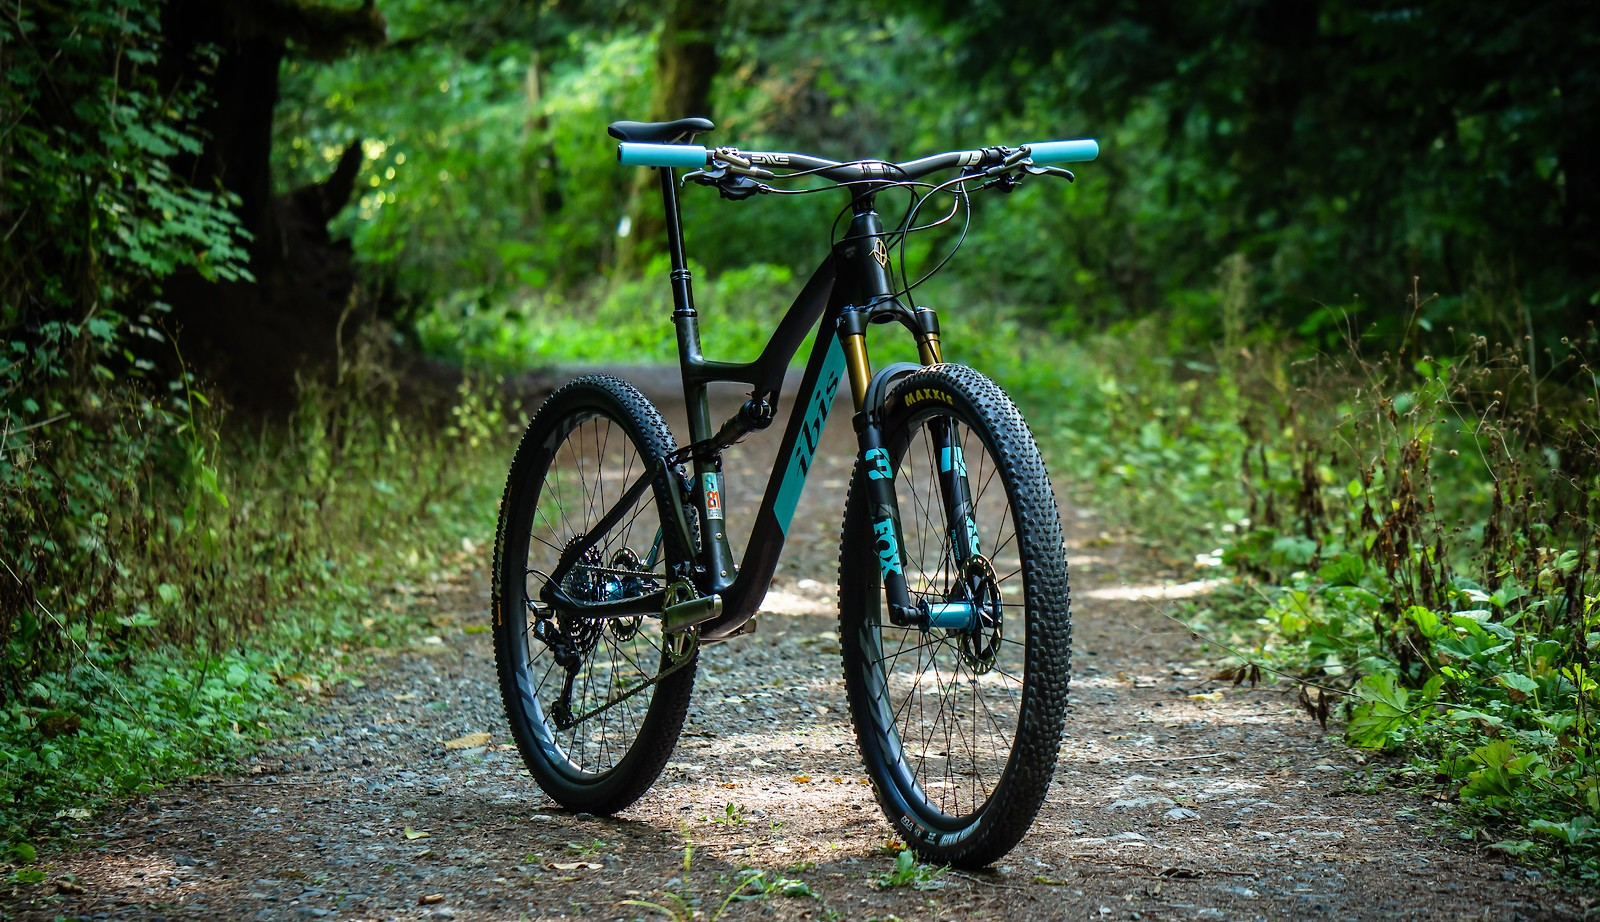 Ibis Exie 40th Anniversary - Vital Bike of the Day September 2021 - Mountain Biking Pictures - Vital MTB